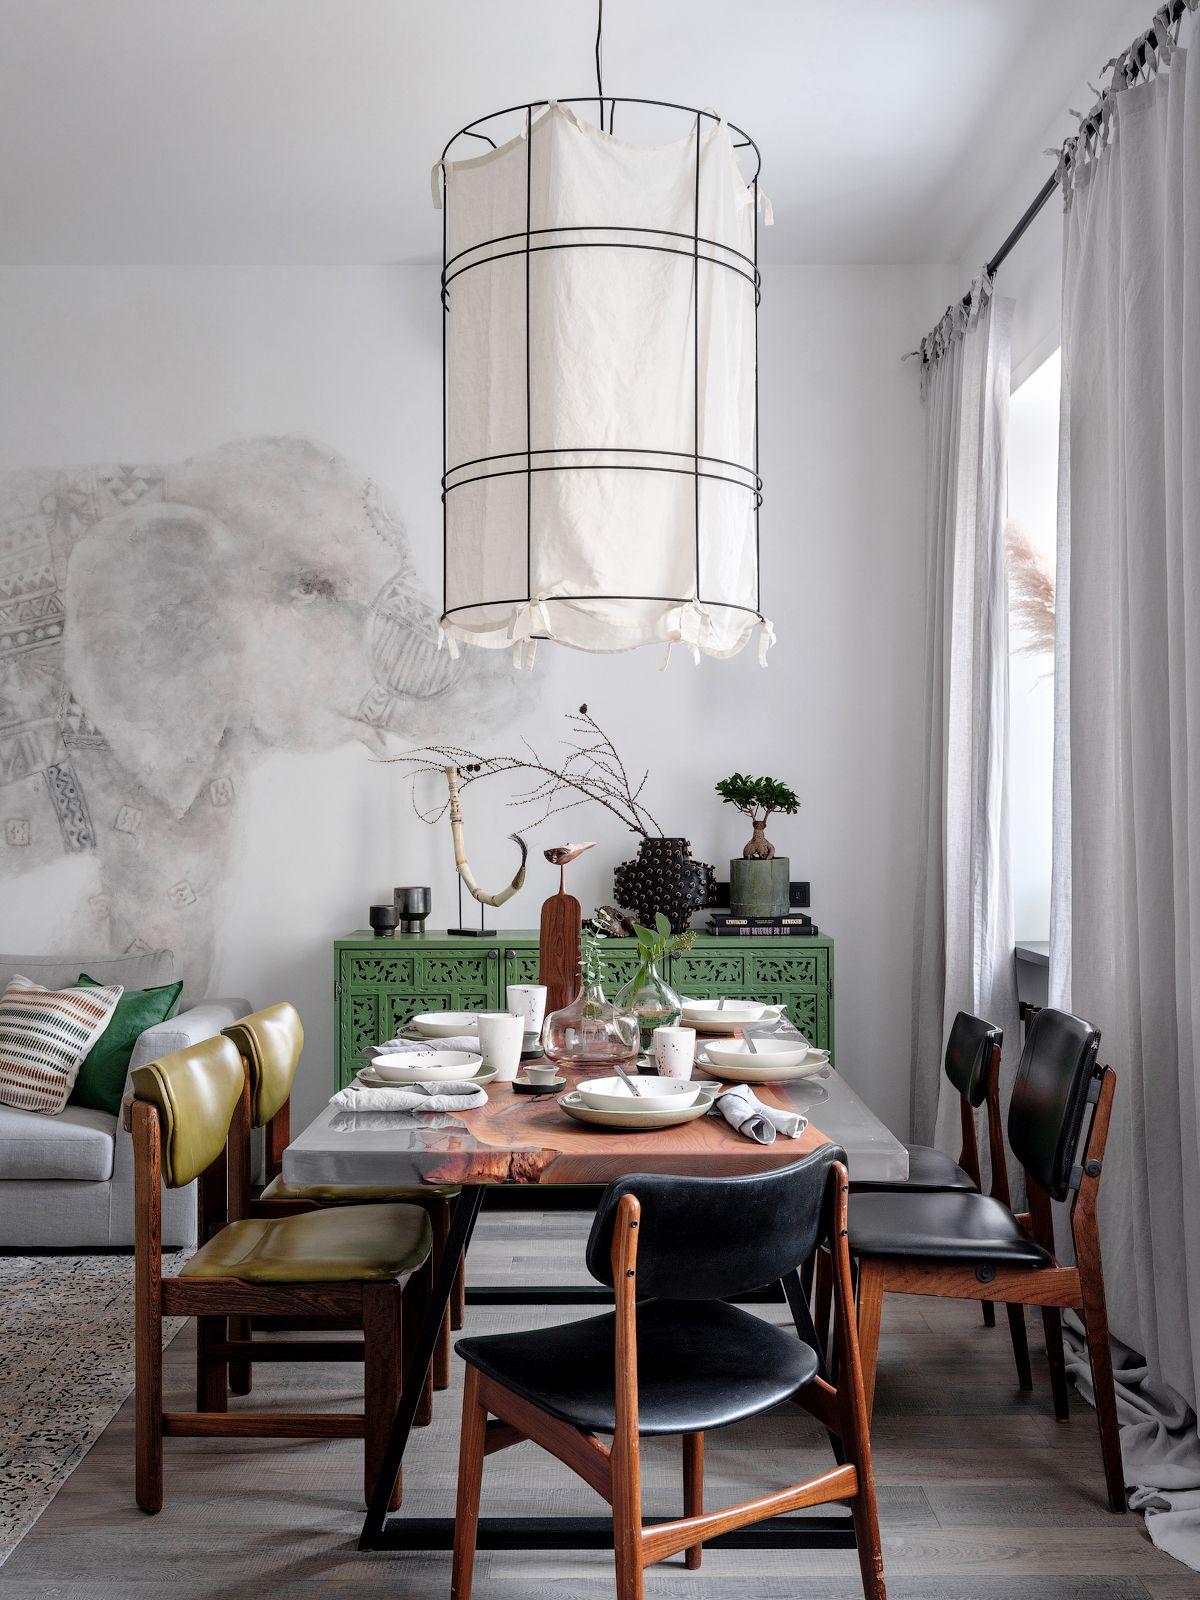 adelaparvu.com despre apartament 90 mp, design Minina Design, Foto Mikhail Loskutov (12)